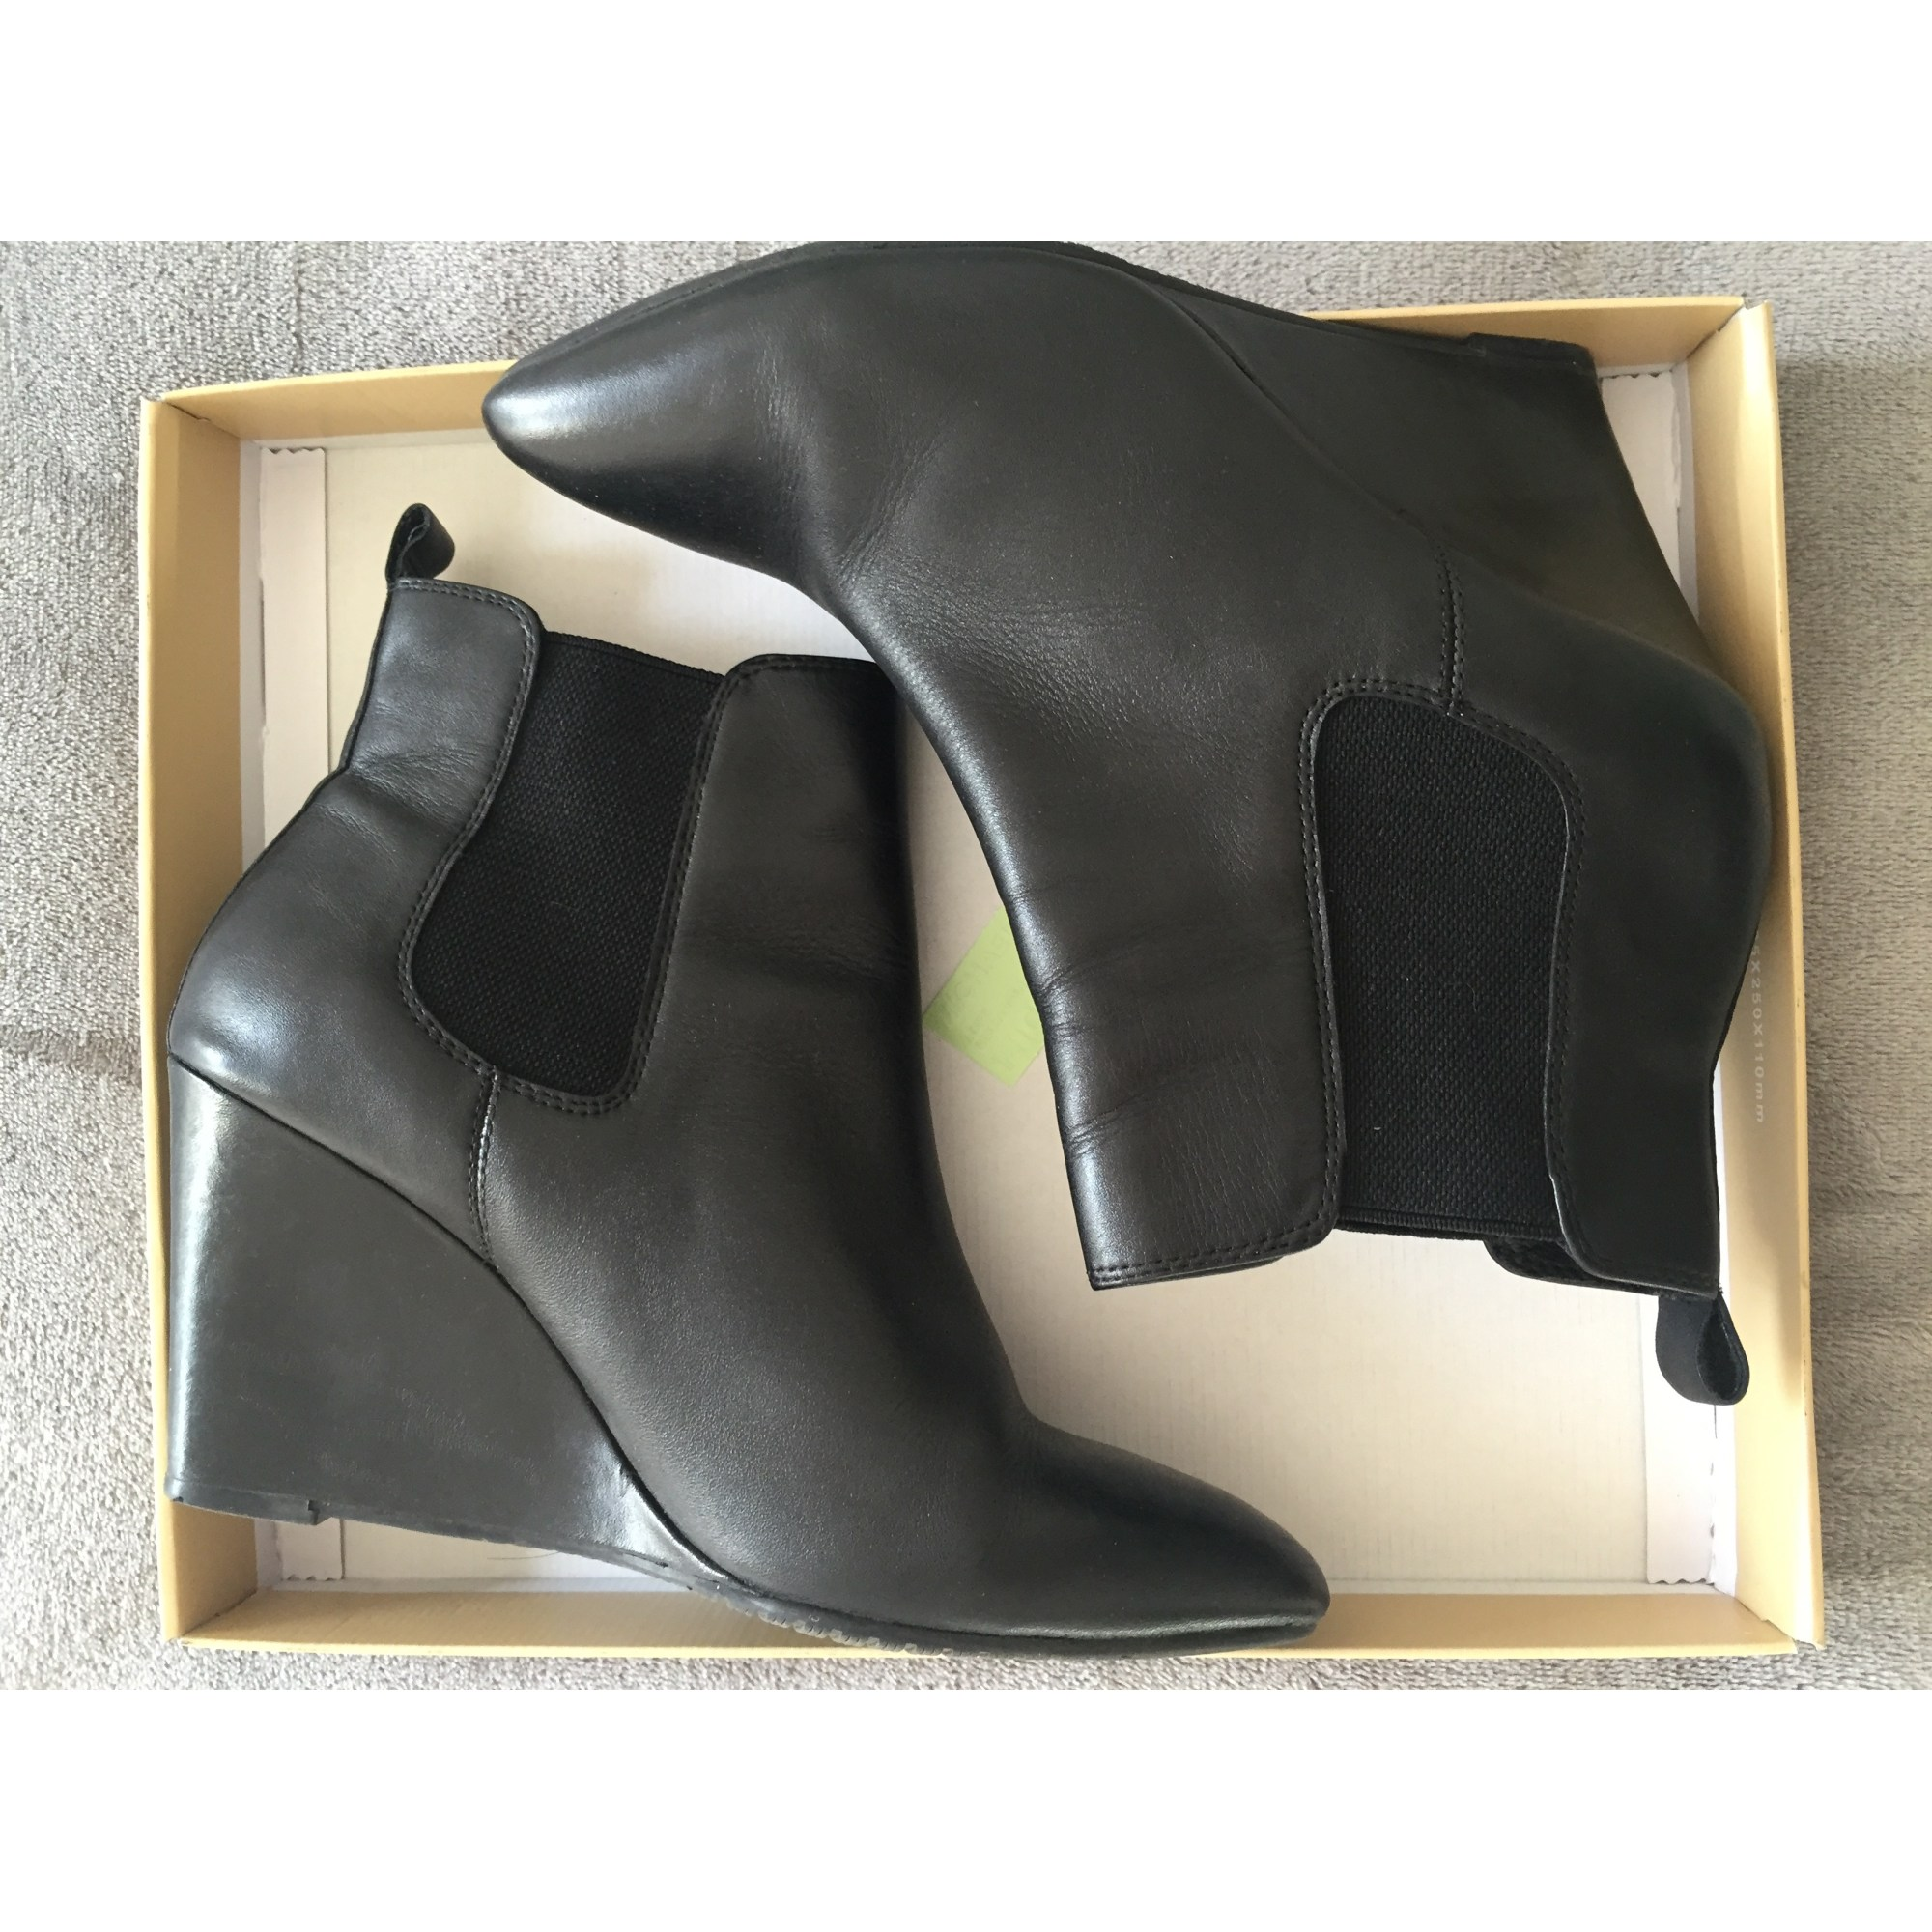 Bottinesamp; Low Low À Boots Bottinesamp; Compensés Boots Low Compensés Bottinesamp; À Boots LVSzUjMpqG